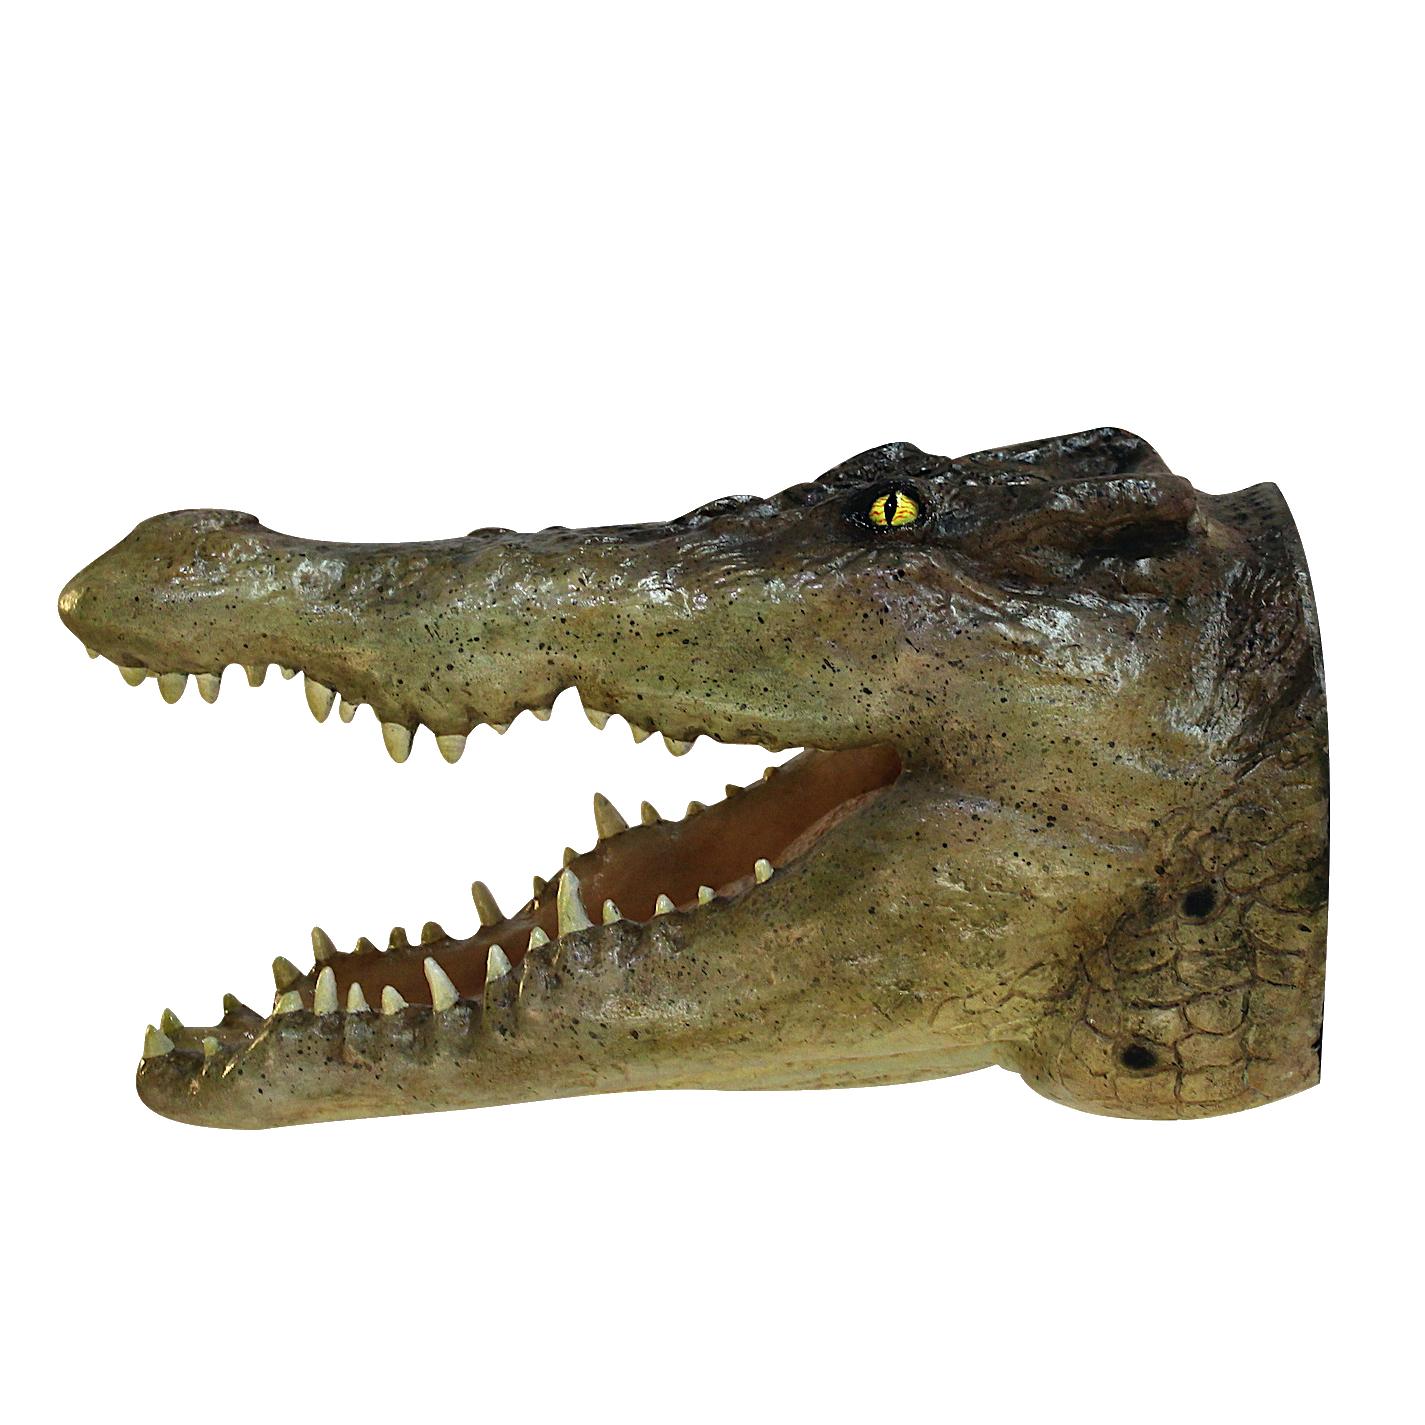 Crocodile Wall Mount Head Life Size 19 Alligator Reptile Sale The Kings Bay